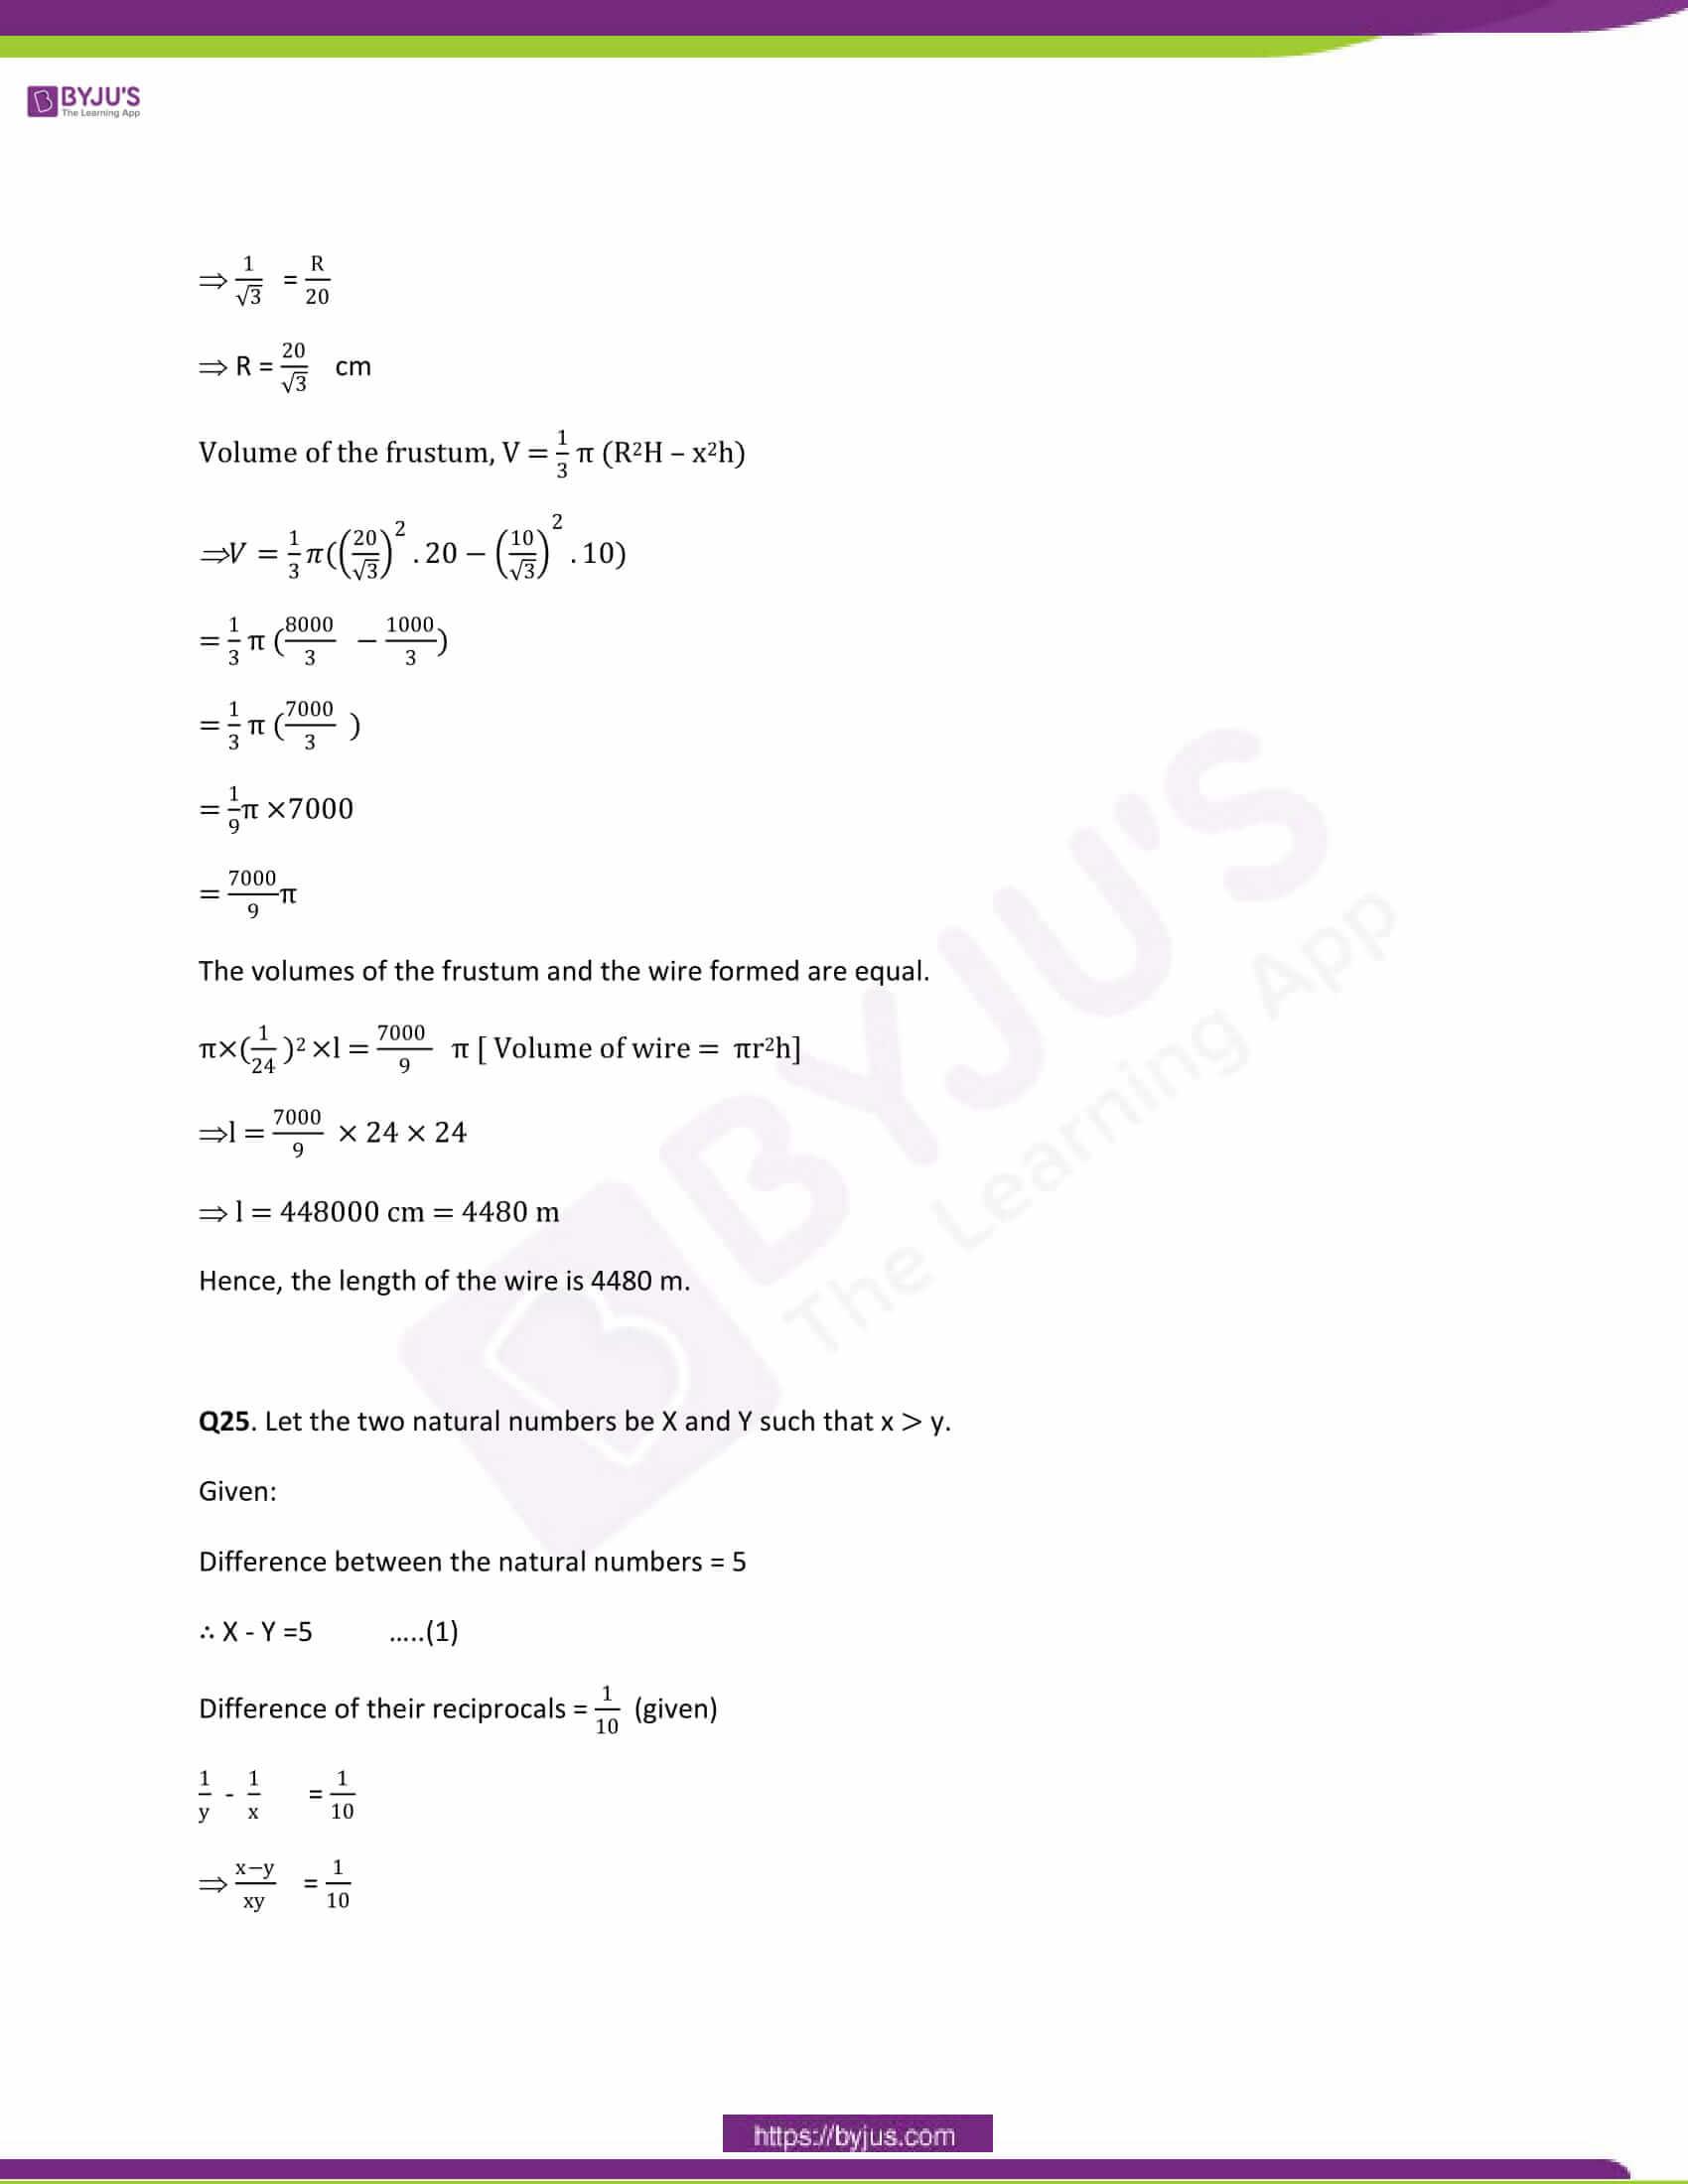 CBSE Class 10 Maths Papers Solution 2014 17